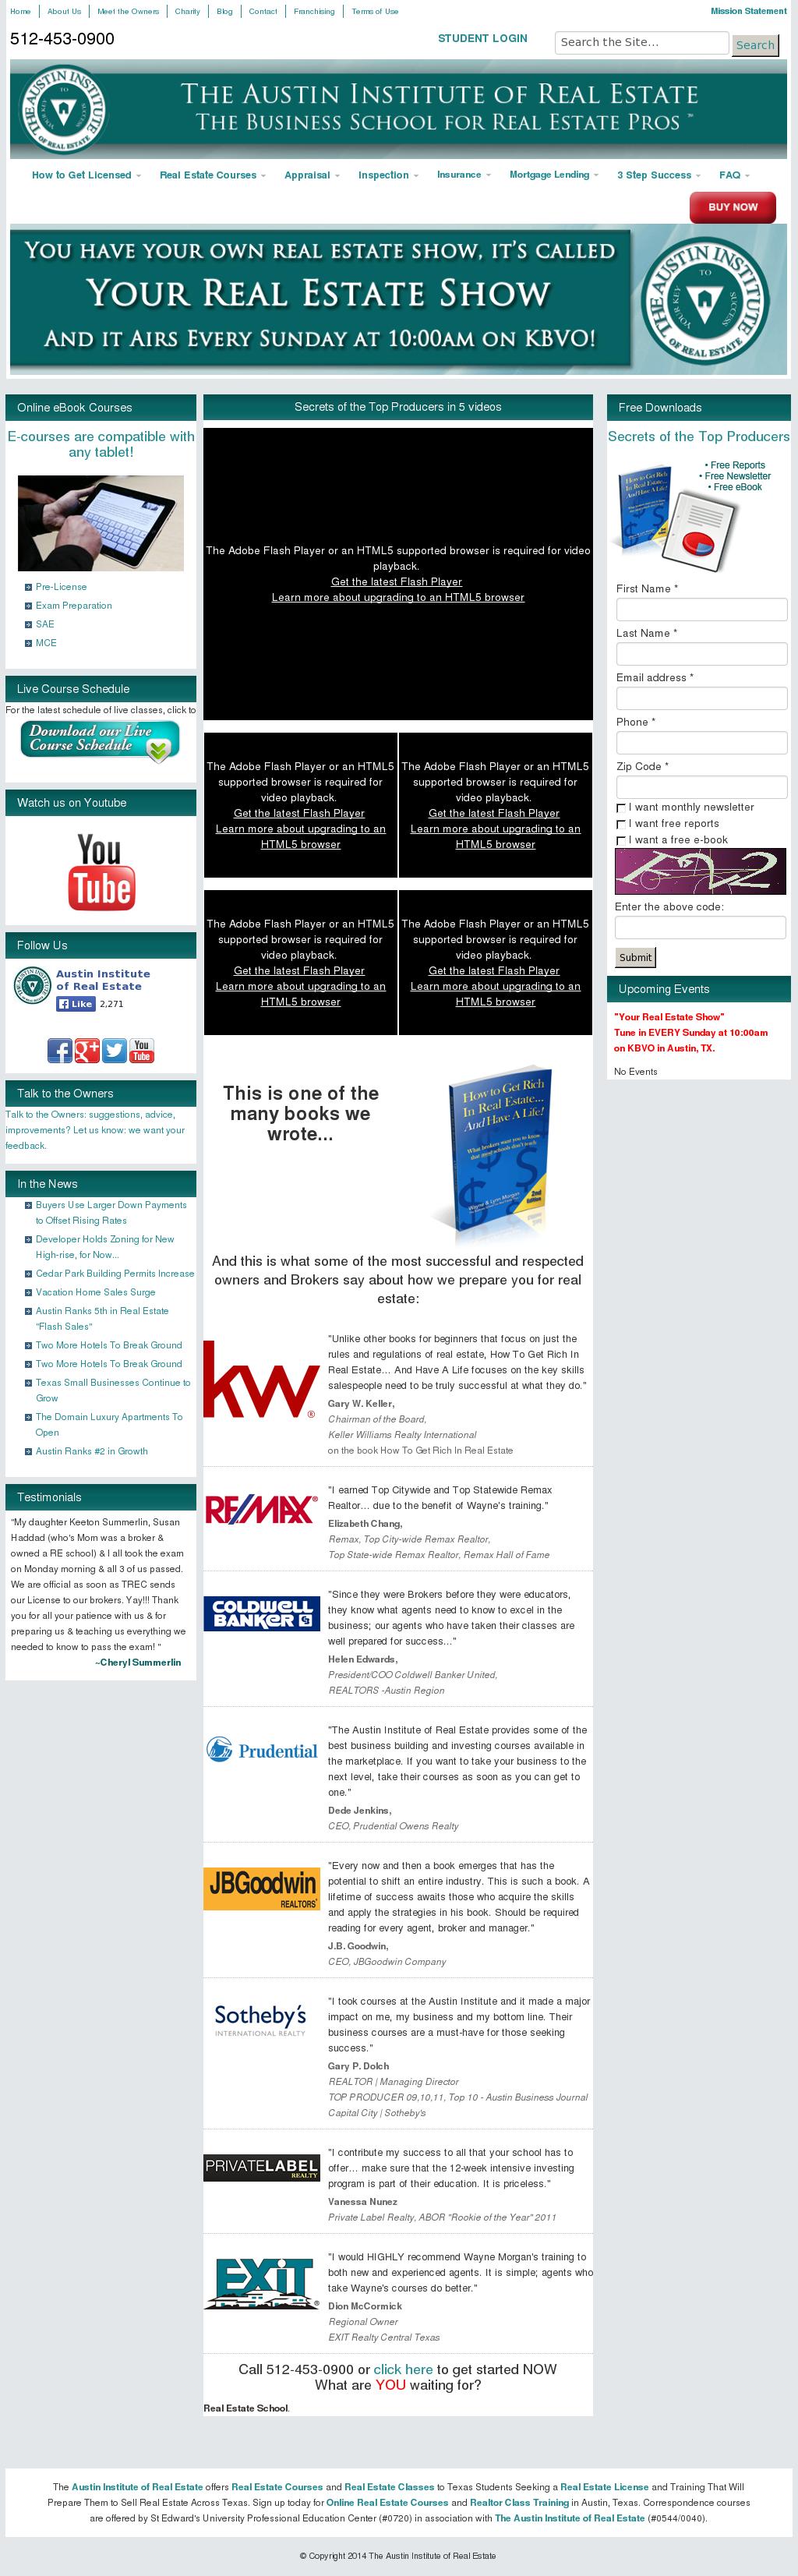 The Austin Institute of Real Estate Competitors, Revenue and